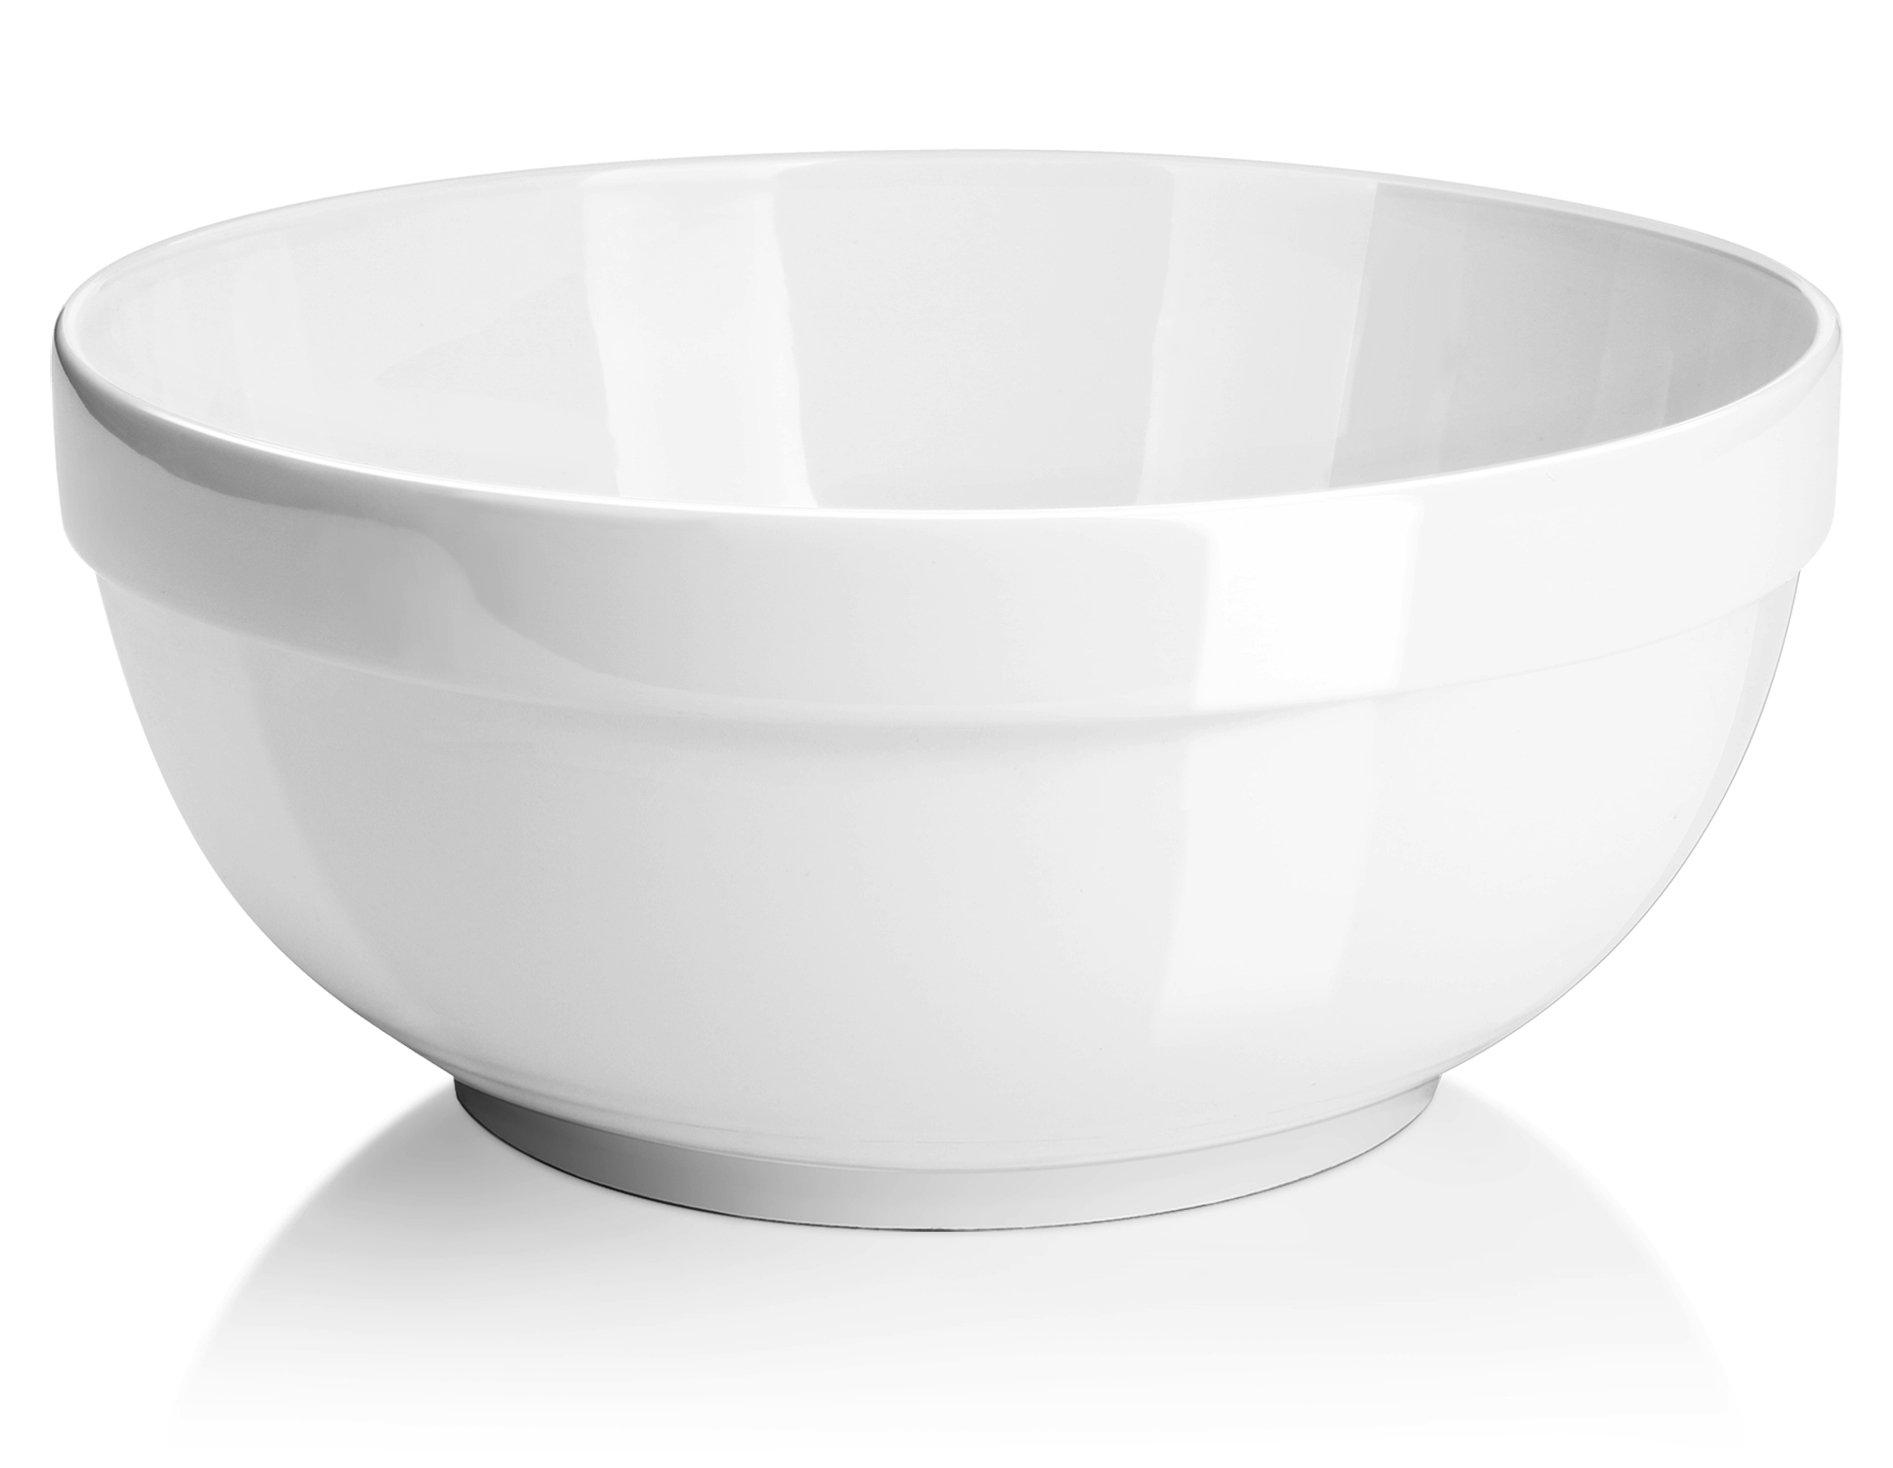 (2 Packs) DOWAN 2 Quarts Porcelain Serving Bowls, Large Soup Bowls, Salad Bowls, White, Anti-slipping, Stackable by DOWAN